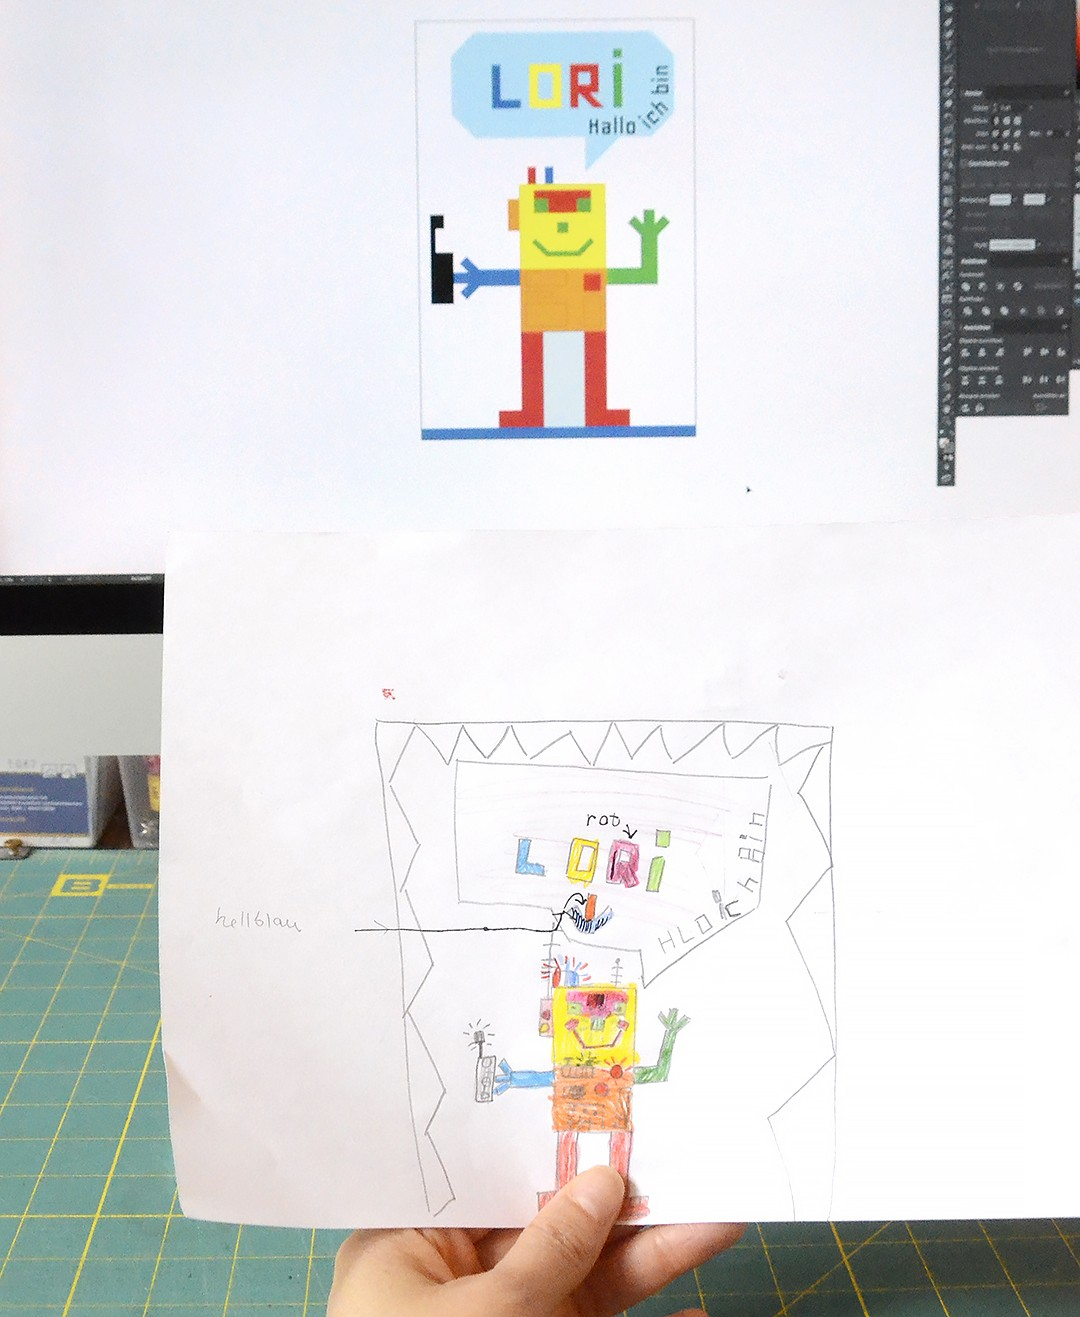 robot-quilt-pattern-nadra-ridgeway-ellis-and-higgs